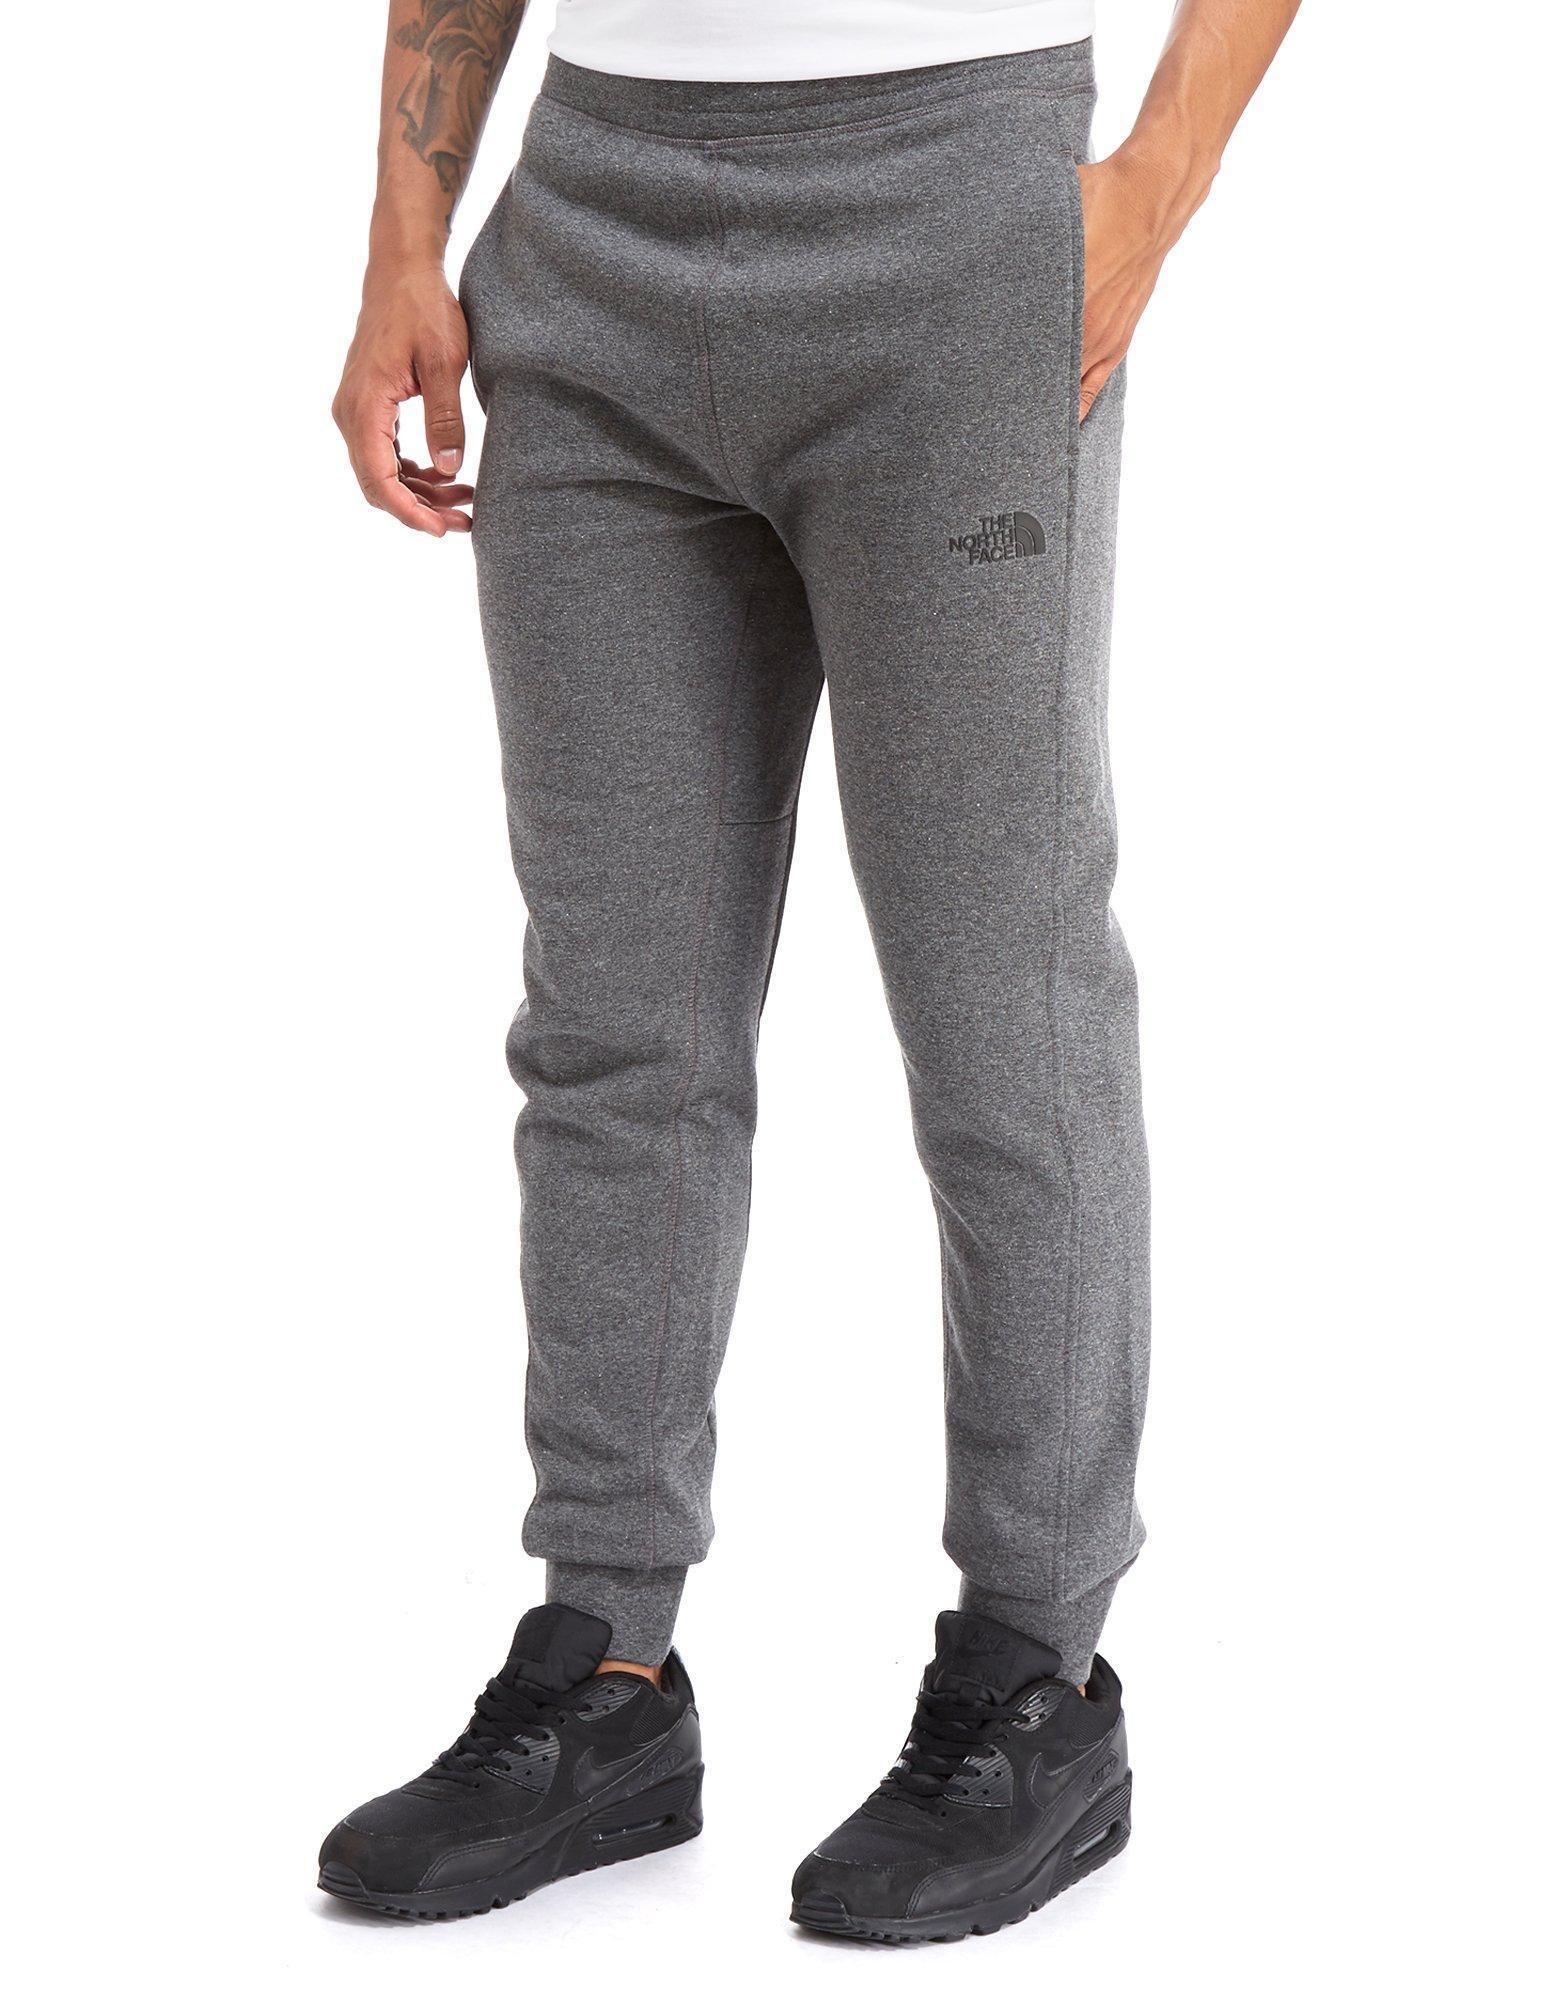 b52f605b2 The North Face Bondi 17 Fleece Tracksuit Pants in Gray for Men - Lyst